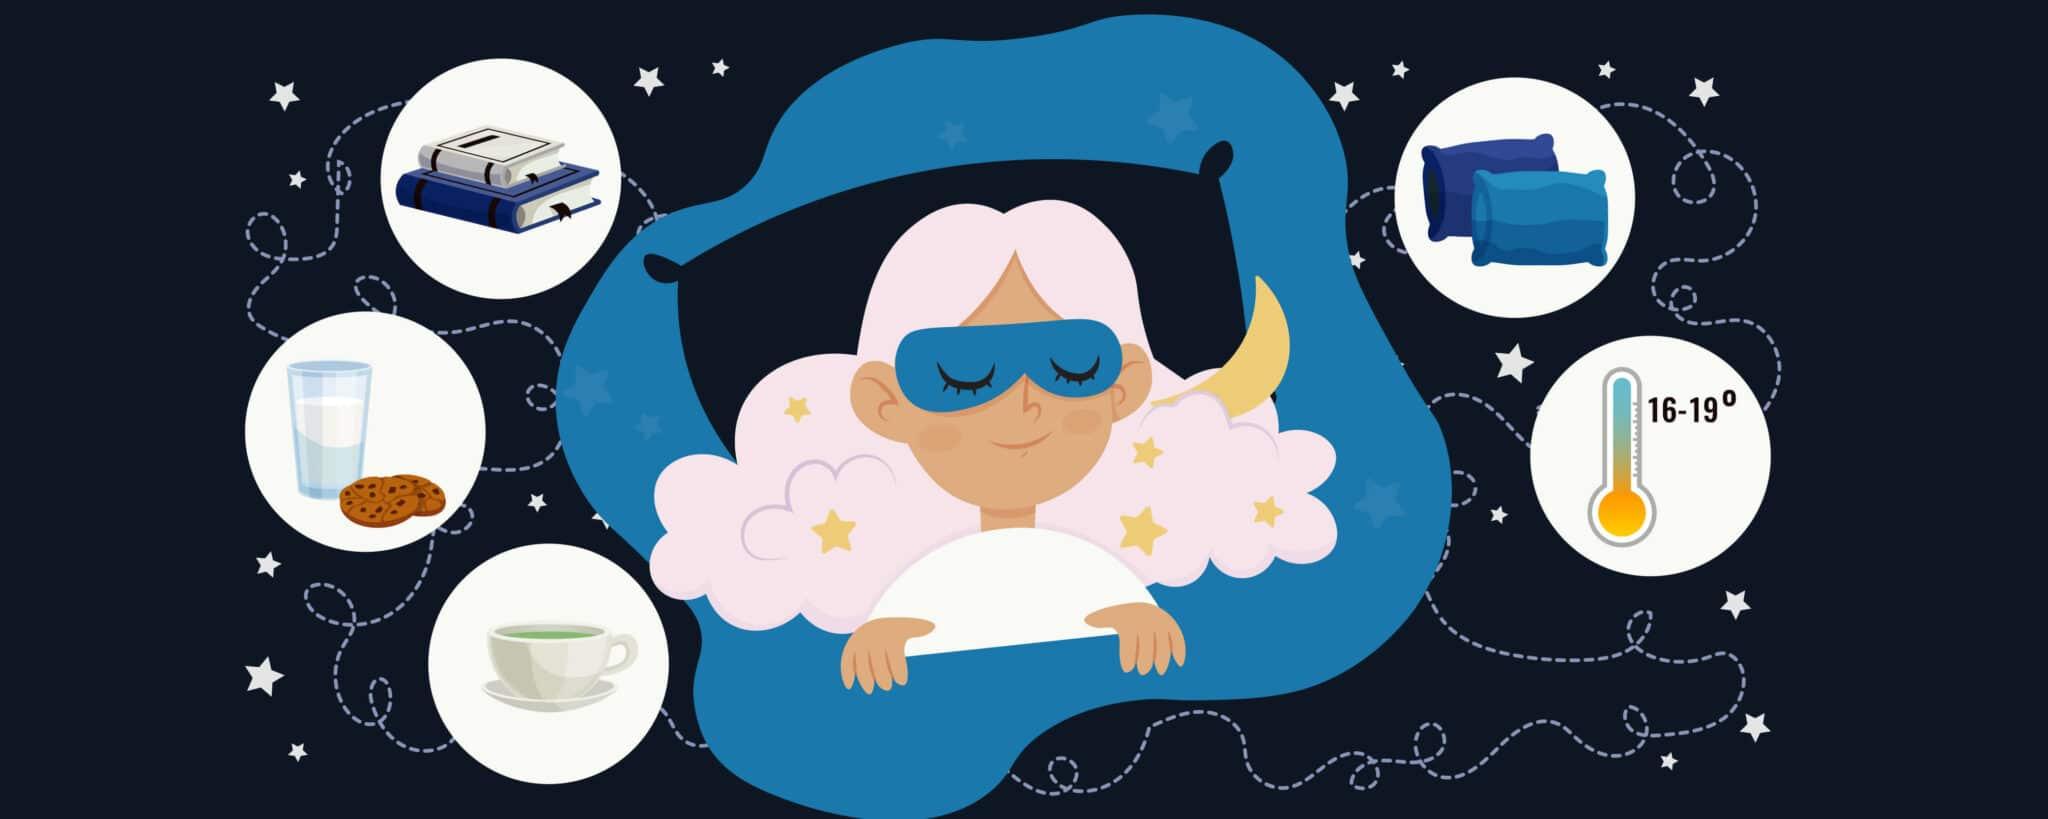 Tips To Sleep Better